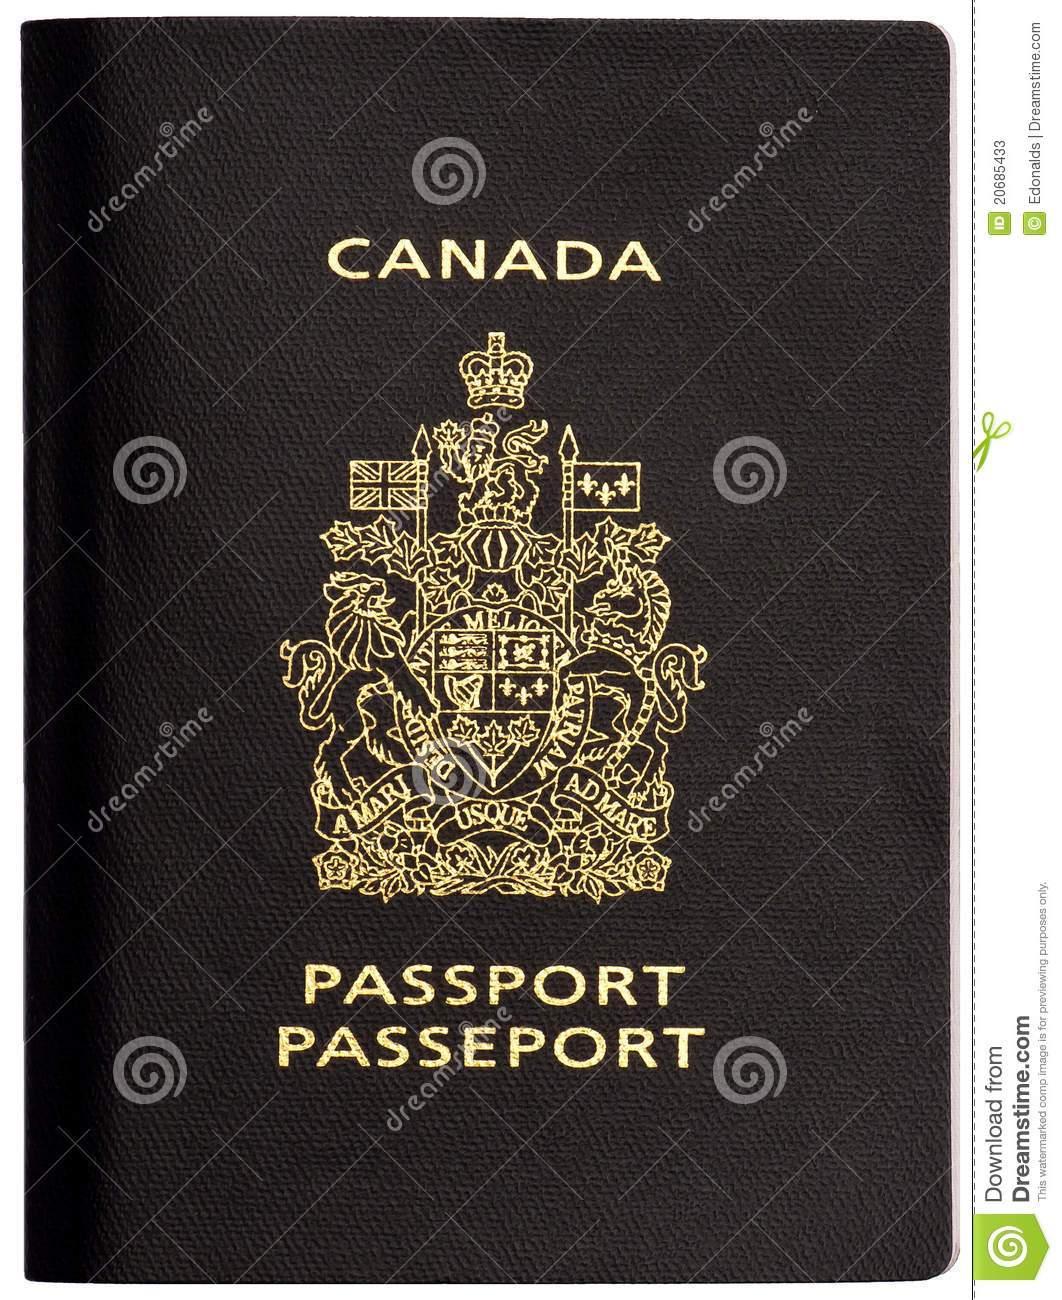 Canadian passport clipart 9 » Clipart Portal.